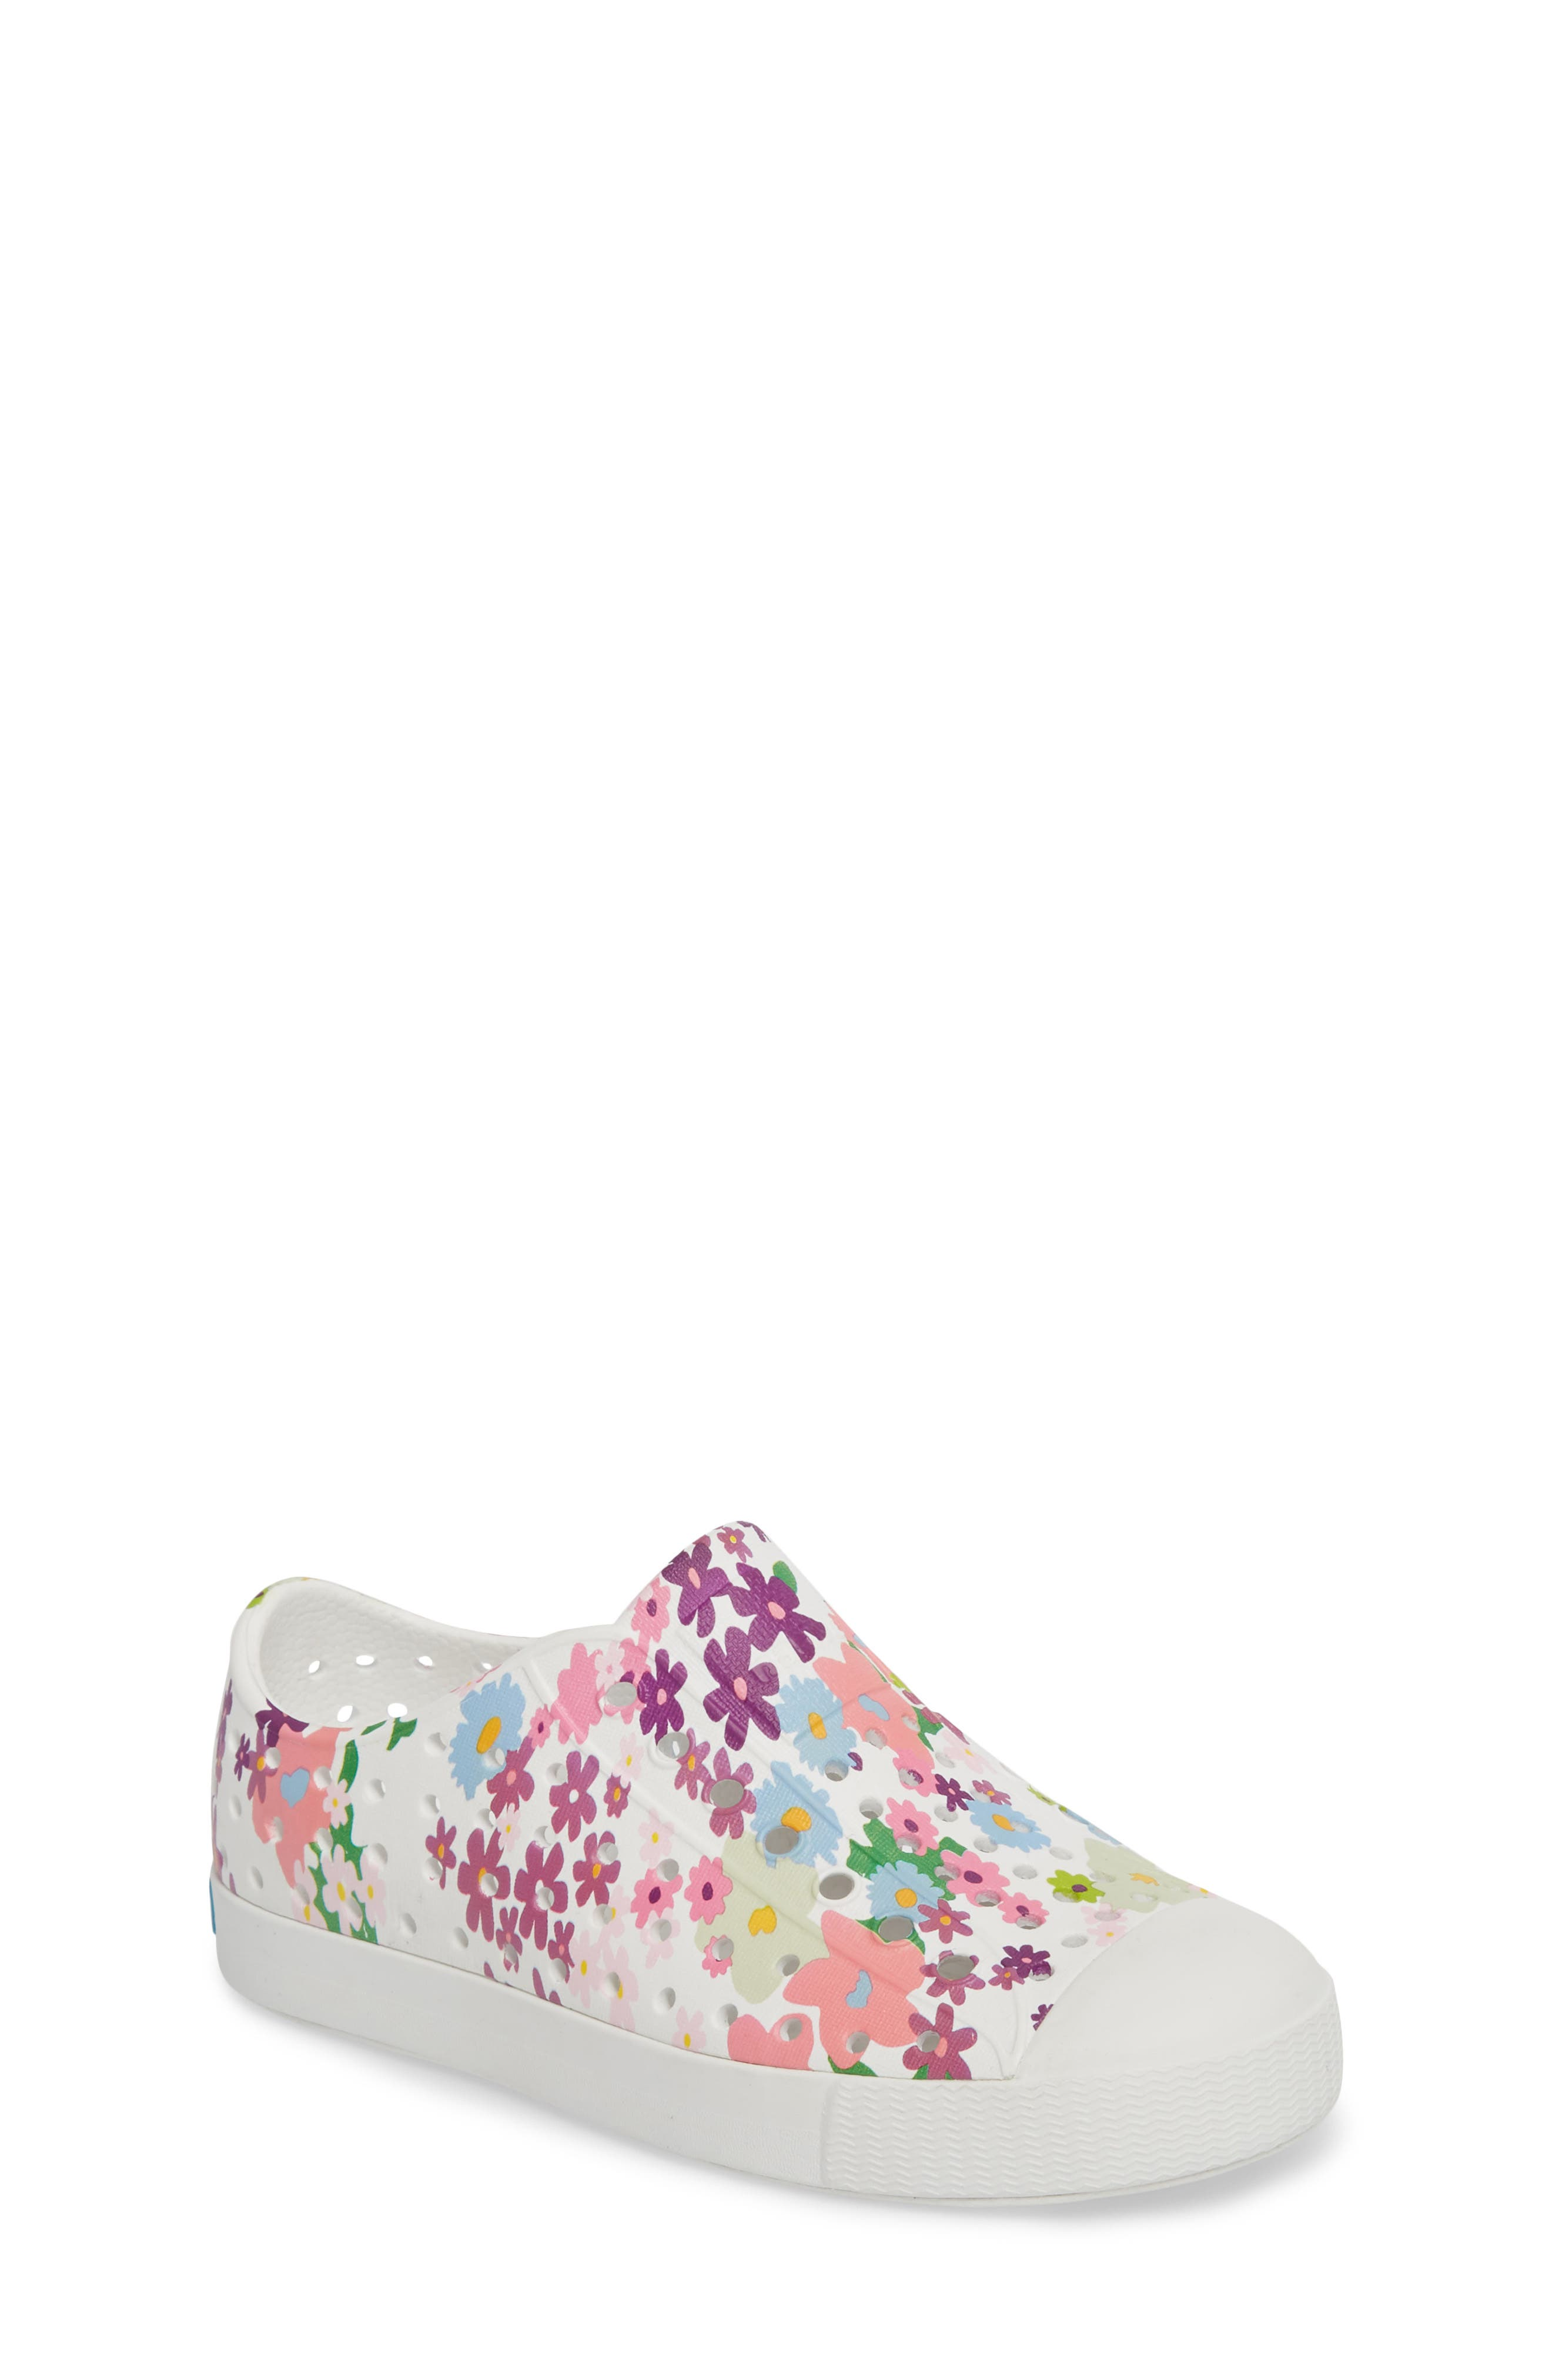 NATIVE SHOES Jefferson Quartz Slip-On Vegan Sneaker, Main, color, SHELL WHITE/ DAISY PRINT